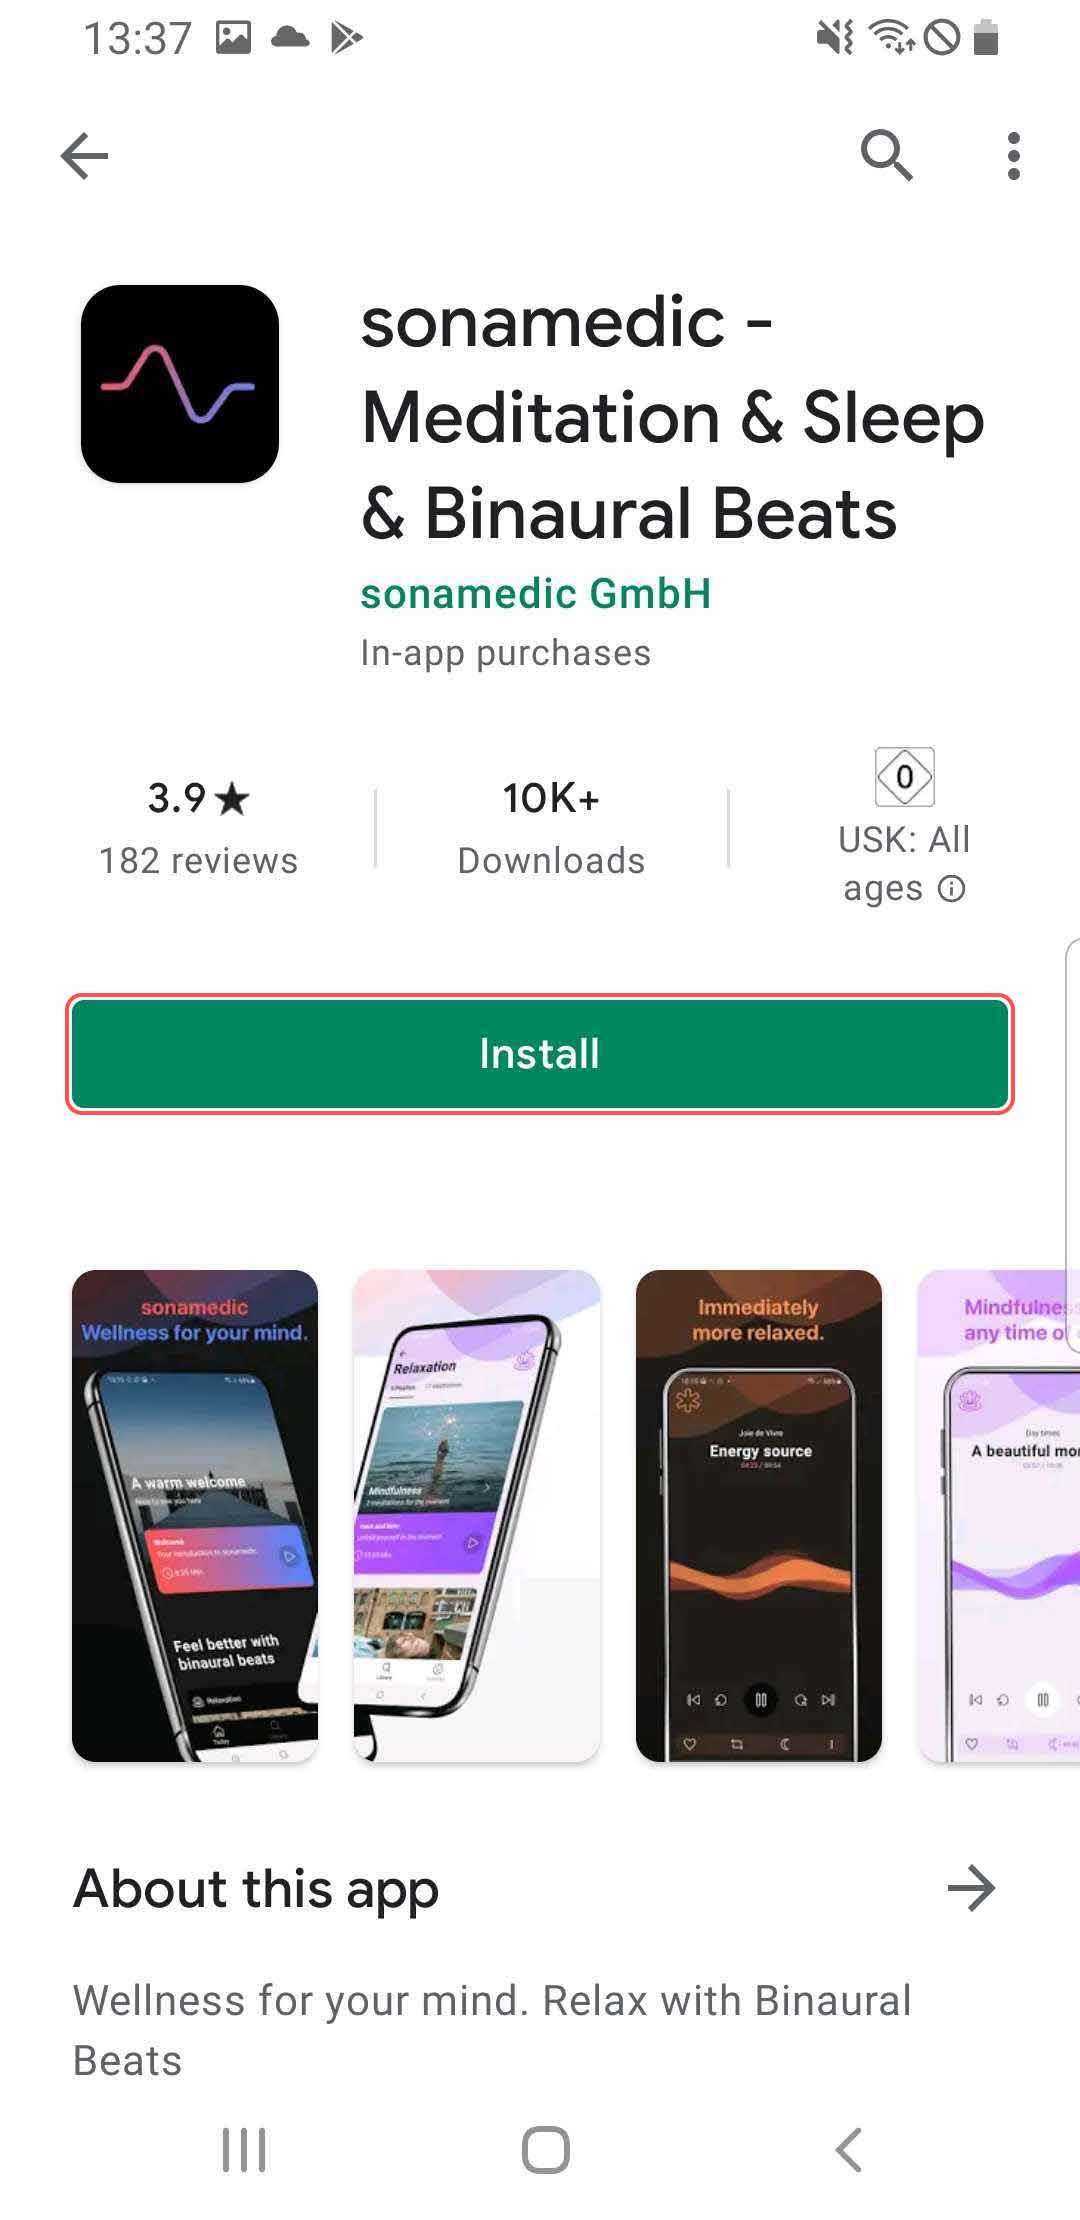 Install sonamedic from Google Play Store